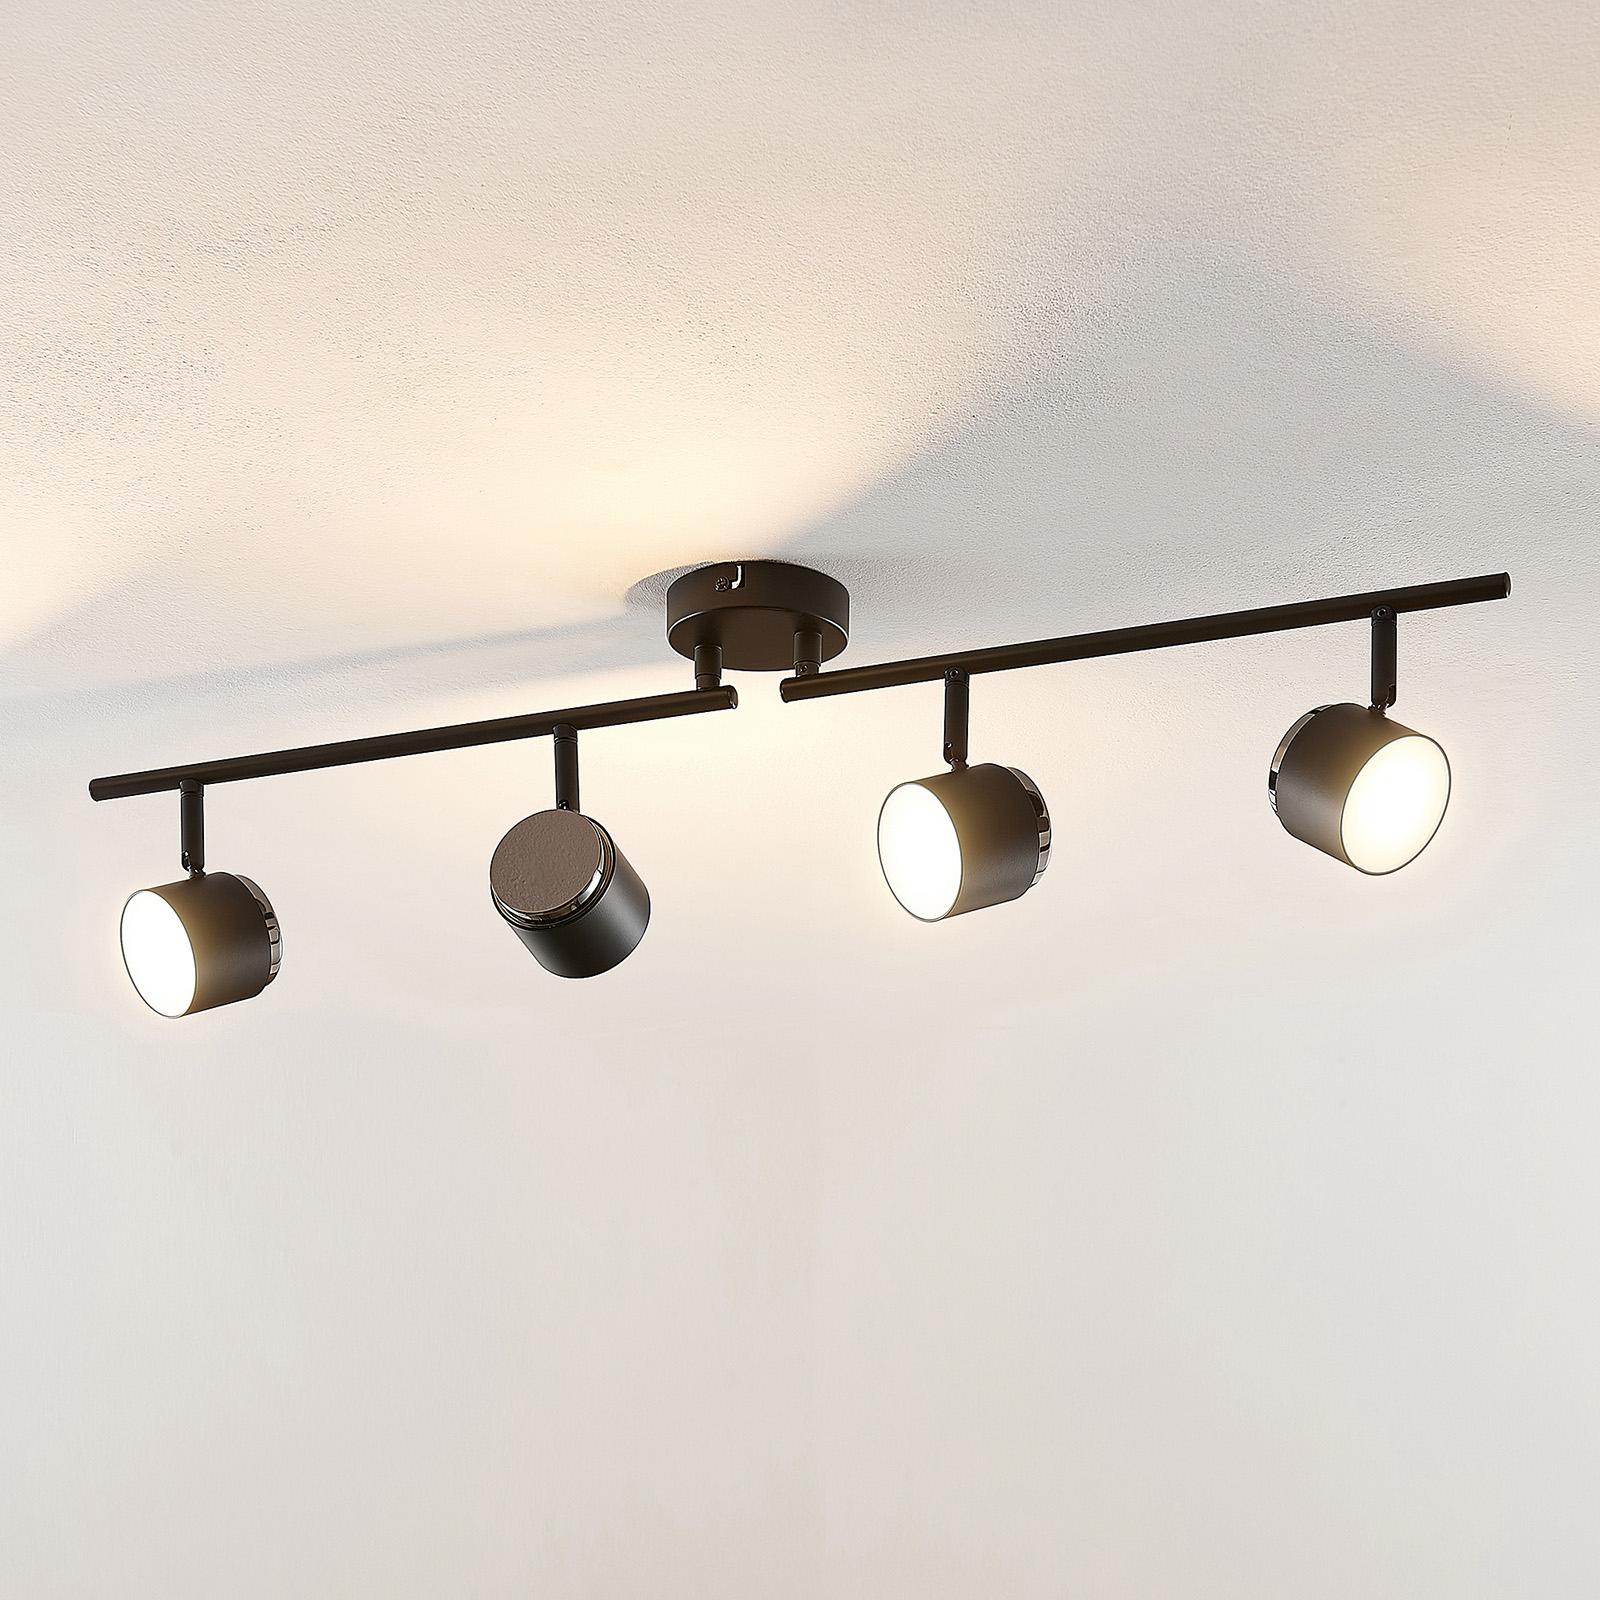 Lindby Marrie Spot LED, noir, 4 lampes